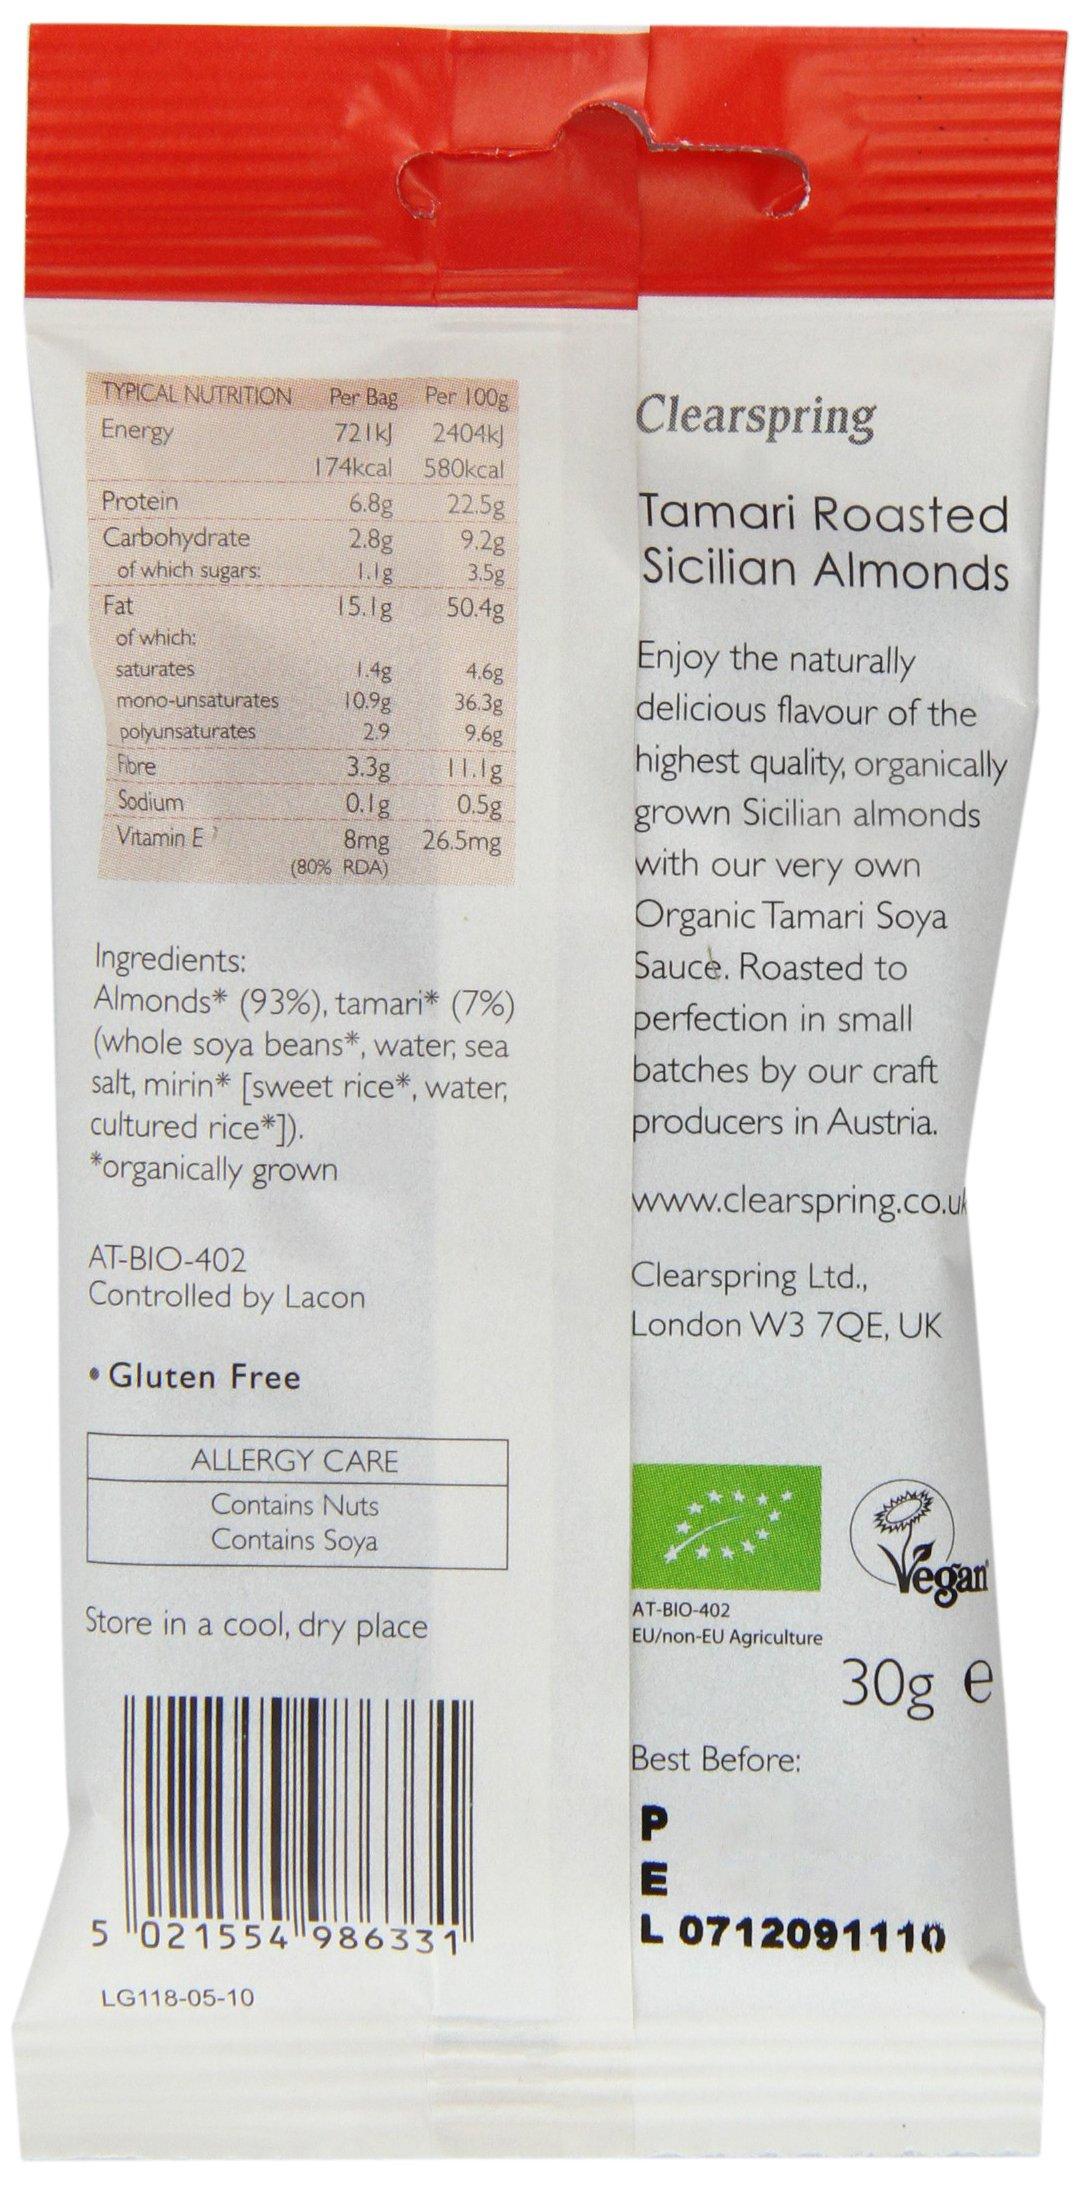 Clearspring - Organic Snack - Tamari Roasted Sicilian Almonds - 30g